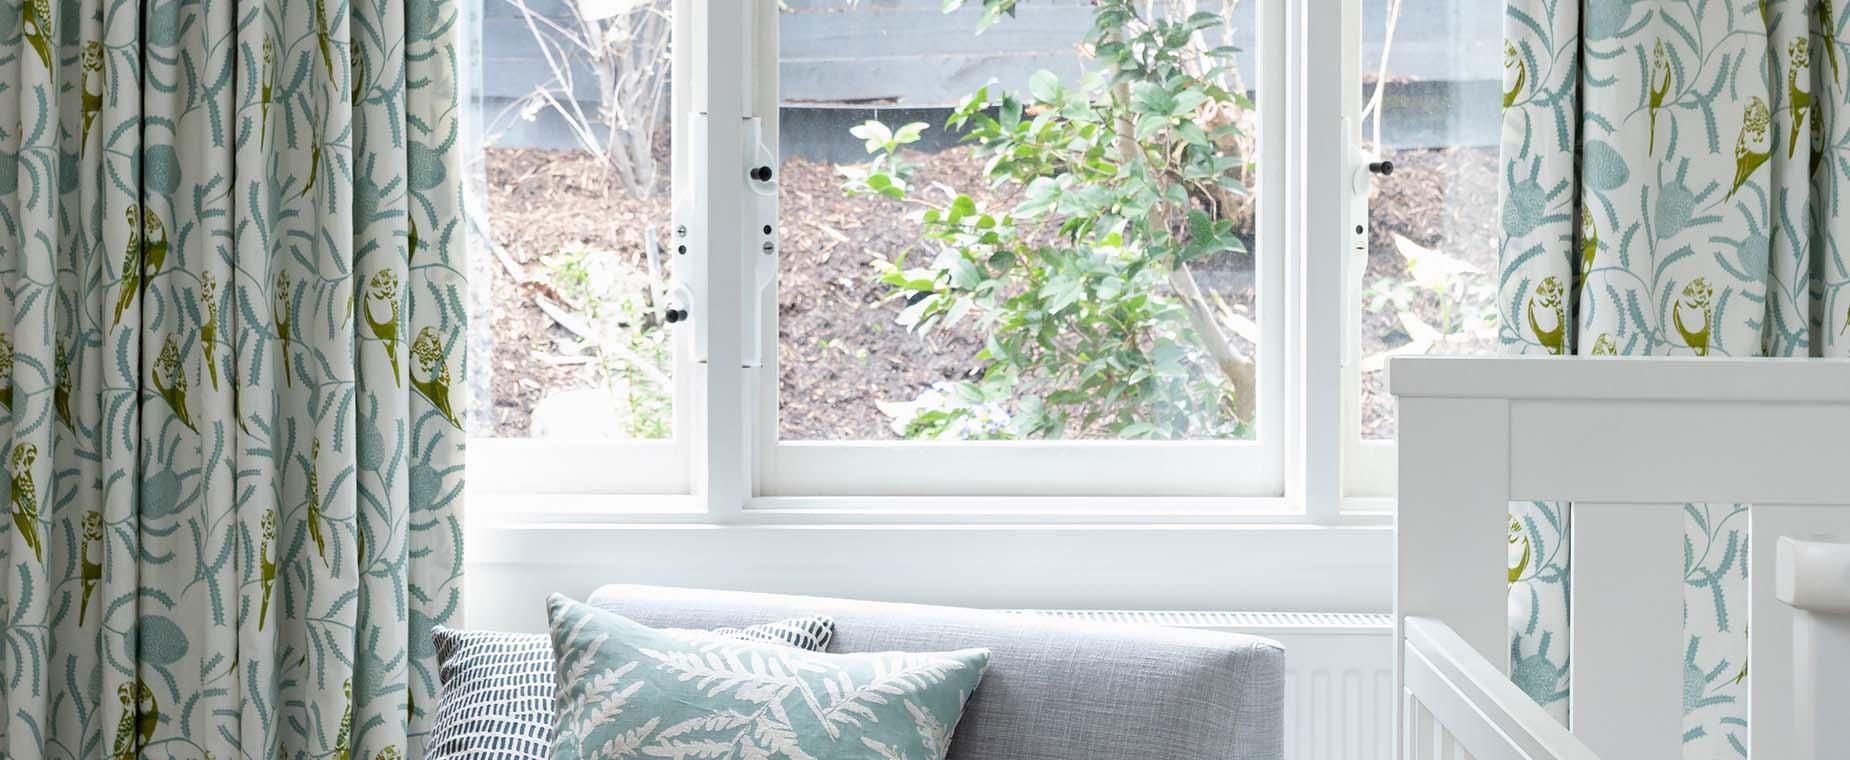 Budgie & Banksia